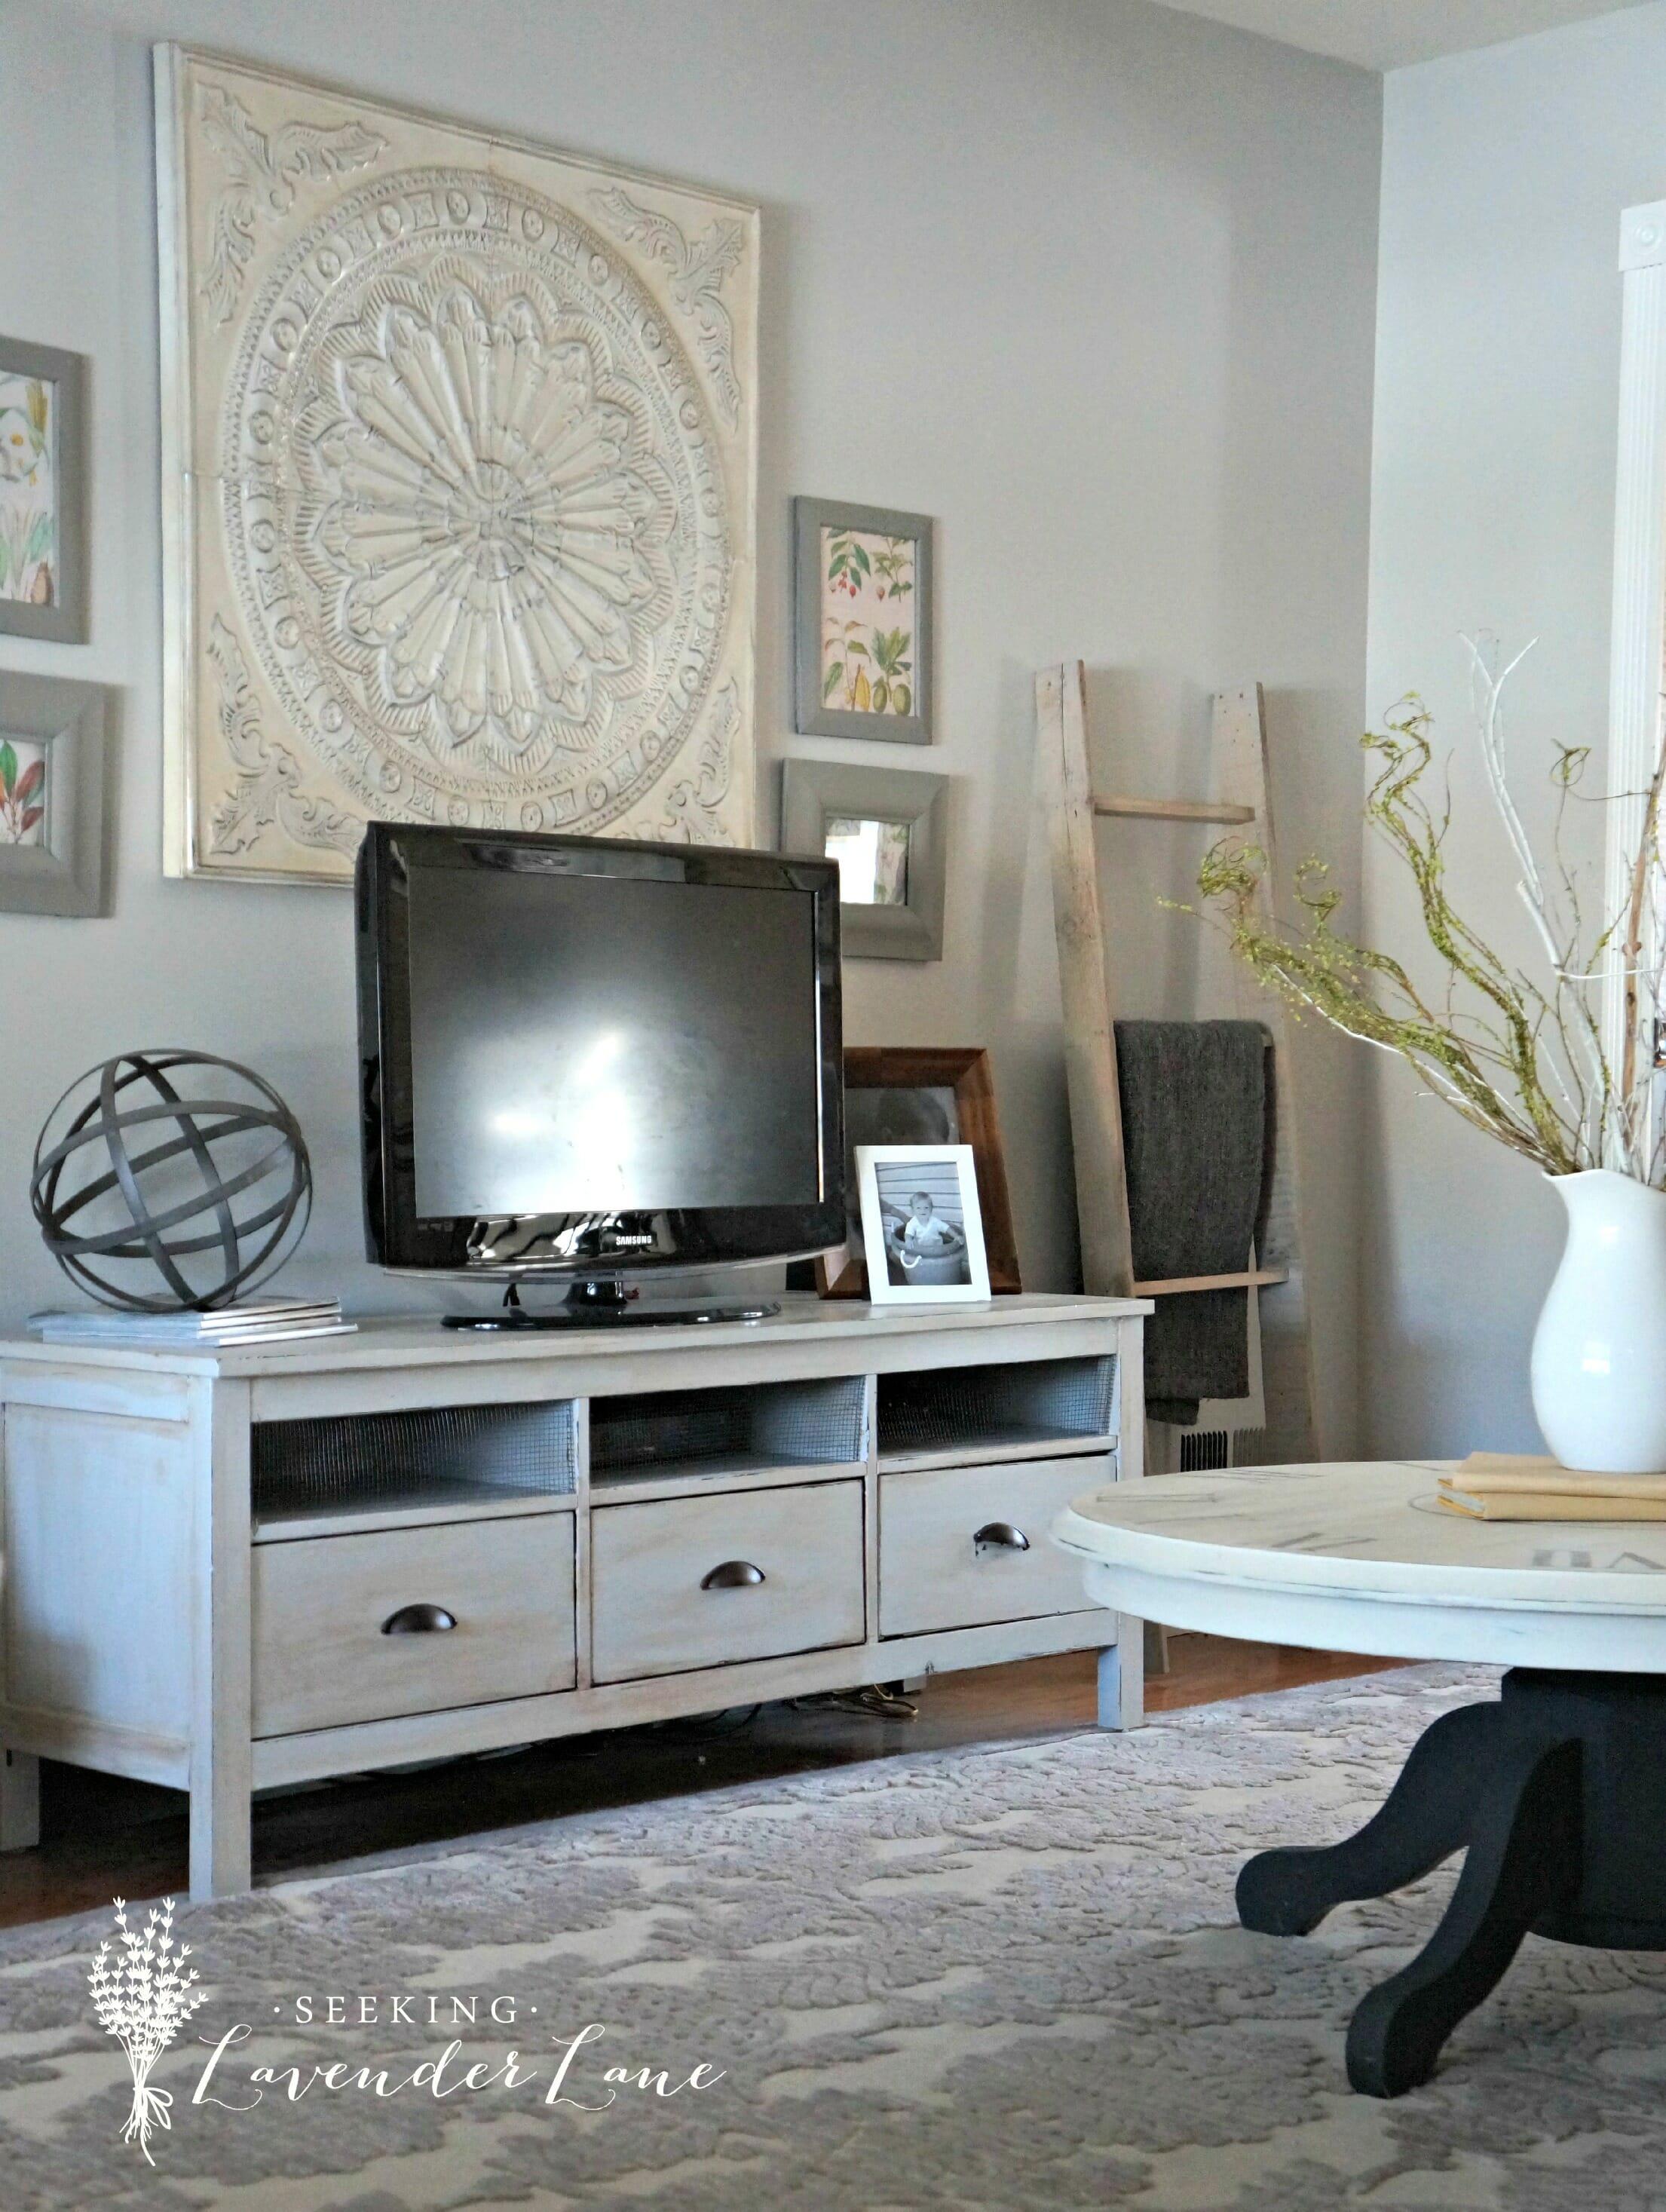 Grey And White Living Room : shelstring blog: Summer Home Tour Series- Seeking Lavendar ...